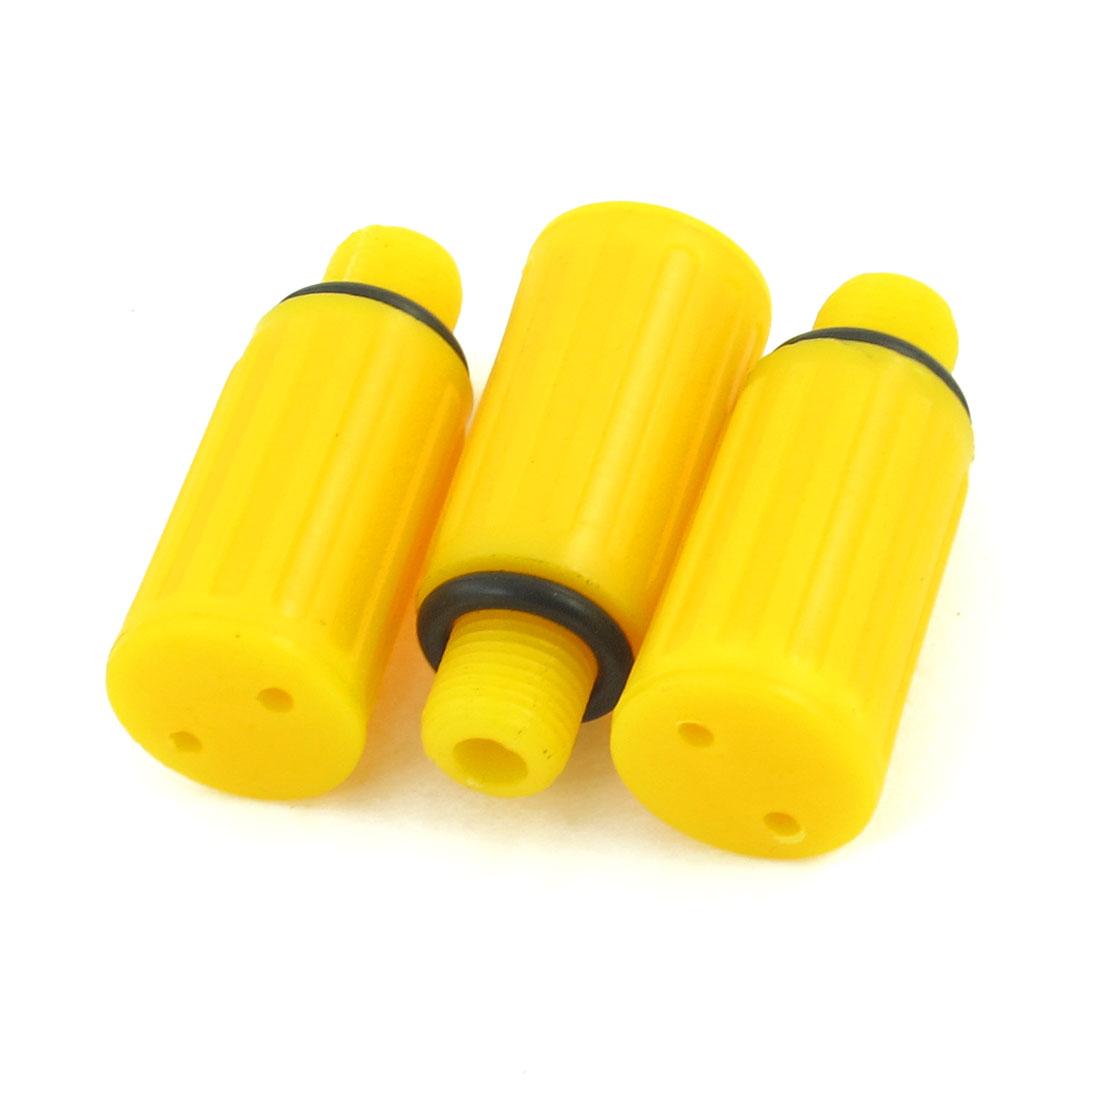 3 Pcs 10mm Male Thread Dia Yellow Plastic Oil Plug for Air Compressor